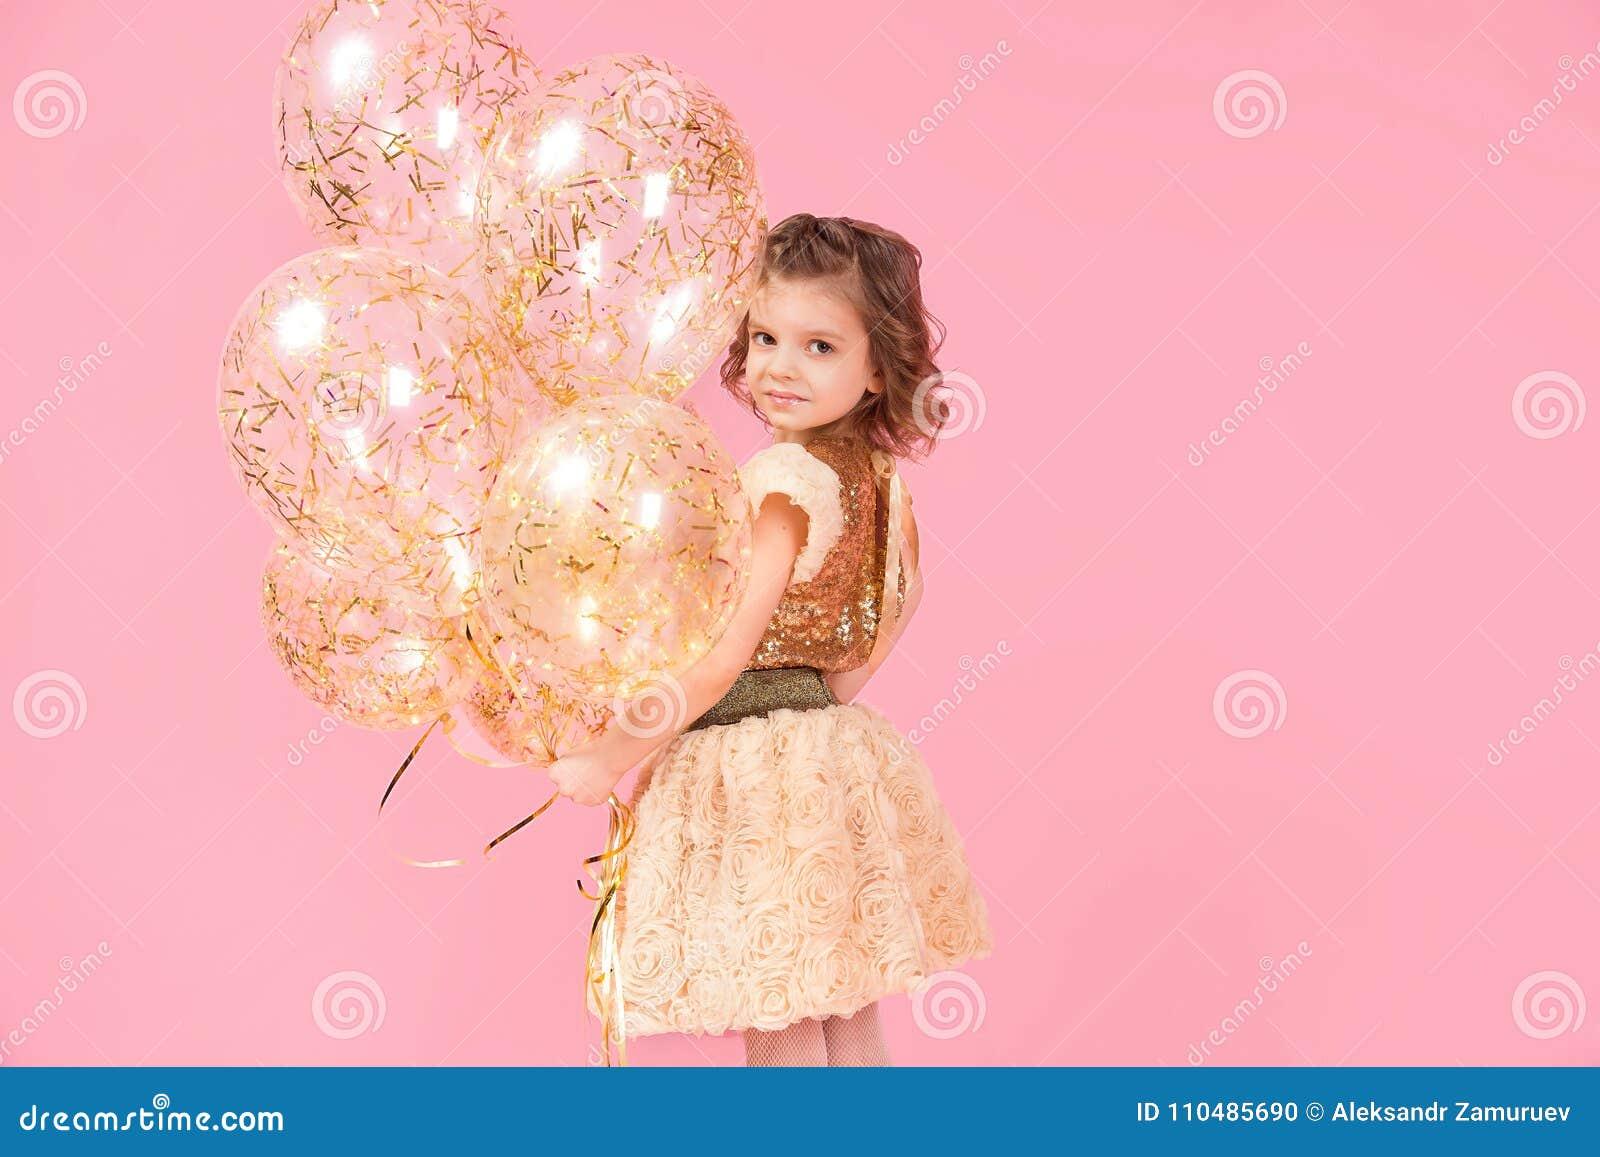 Adorable girl with balloons